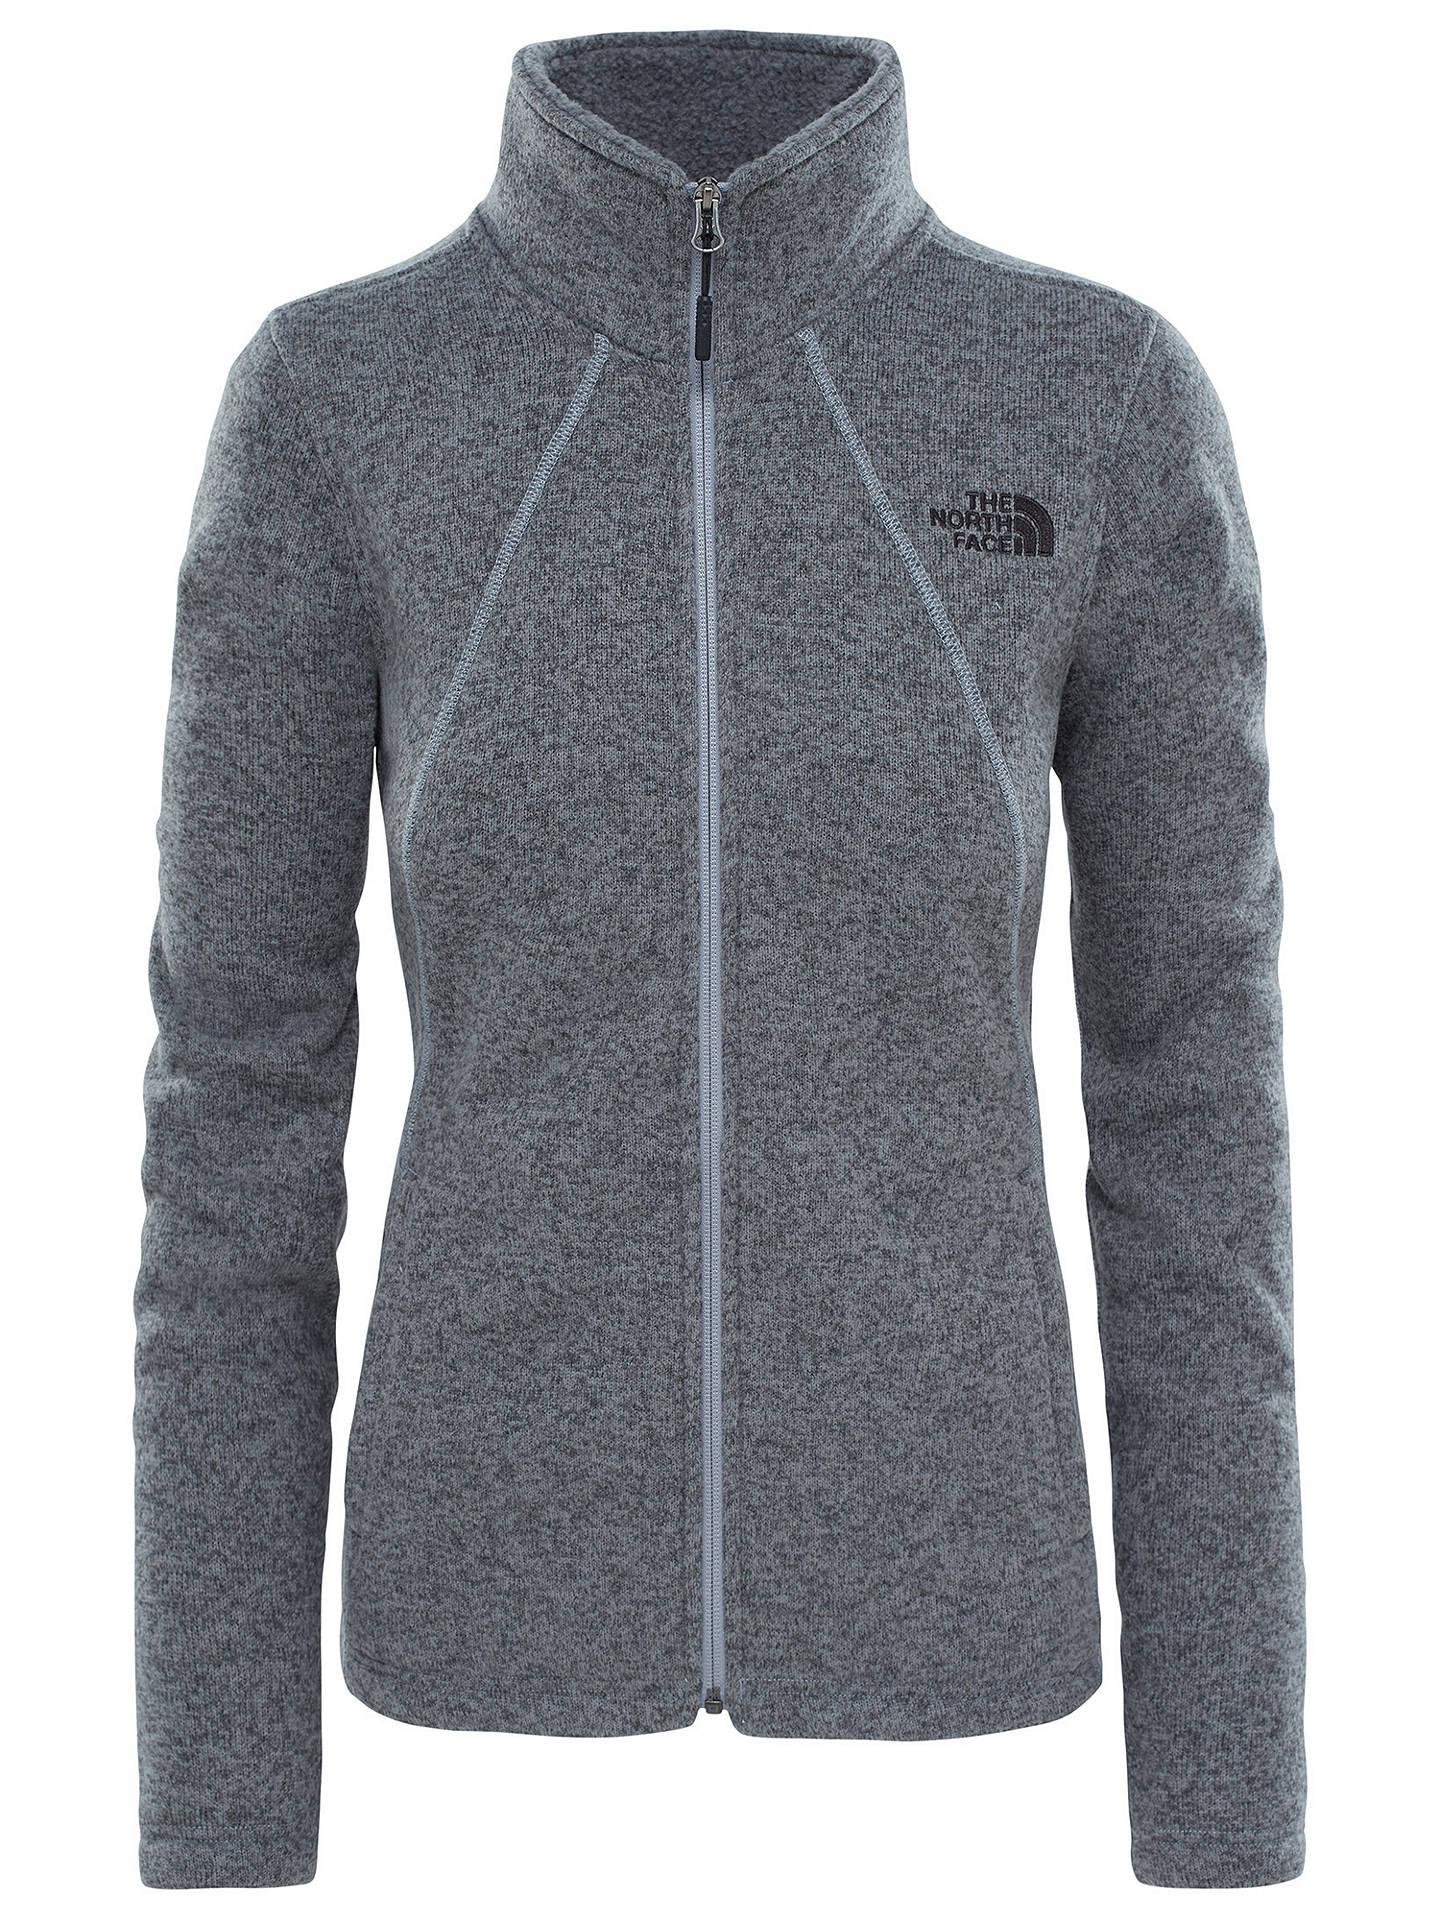 941331773a0 The North Face Crescent Full Zip Women's Fleece Jacket, Grey at John ...